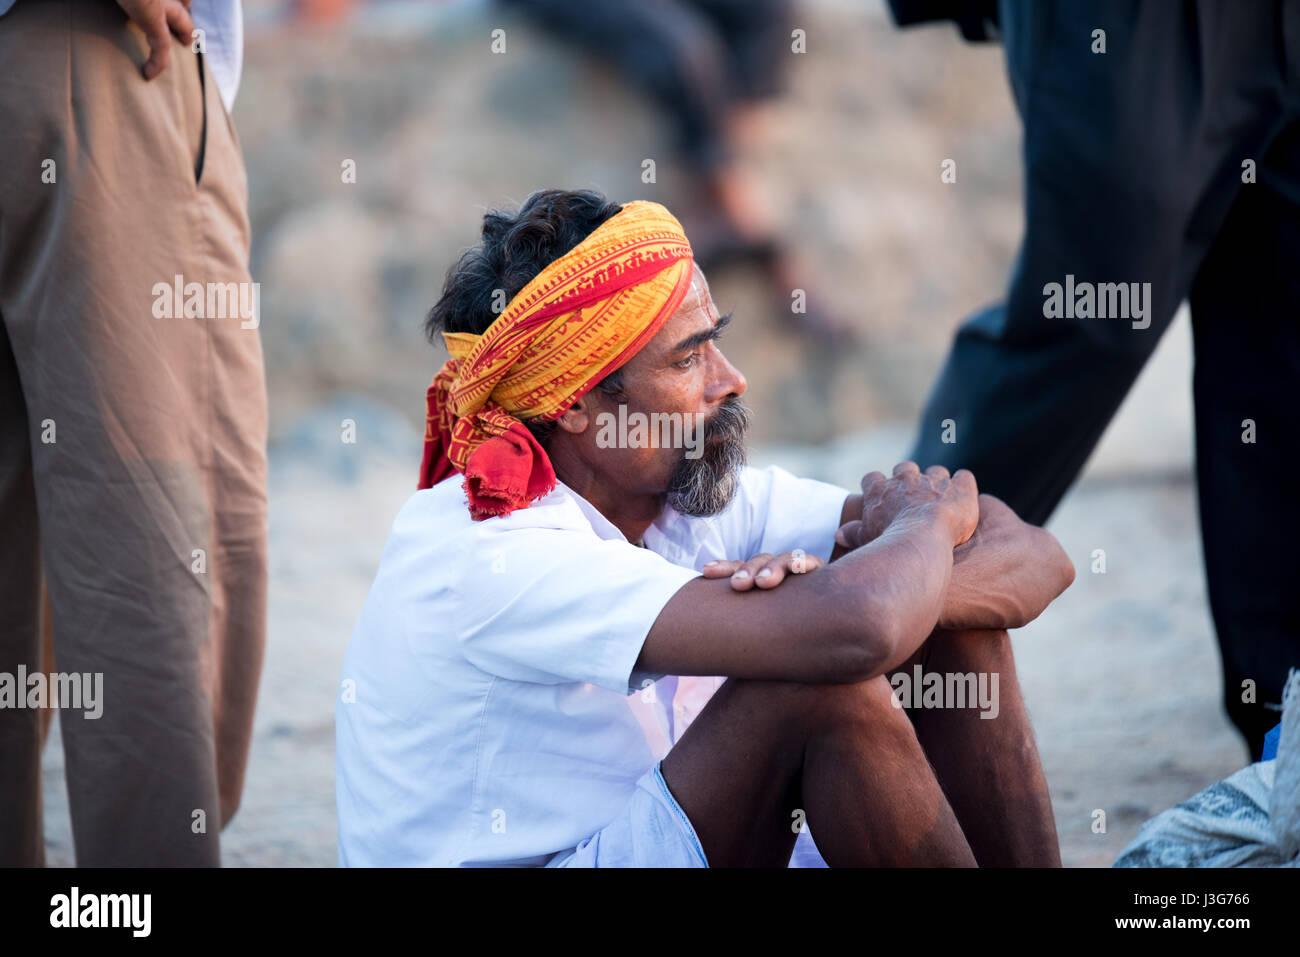 Men gazing sitting on the ground inmidst a crowd of people in Kanyakumari, India - Stock Image